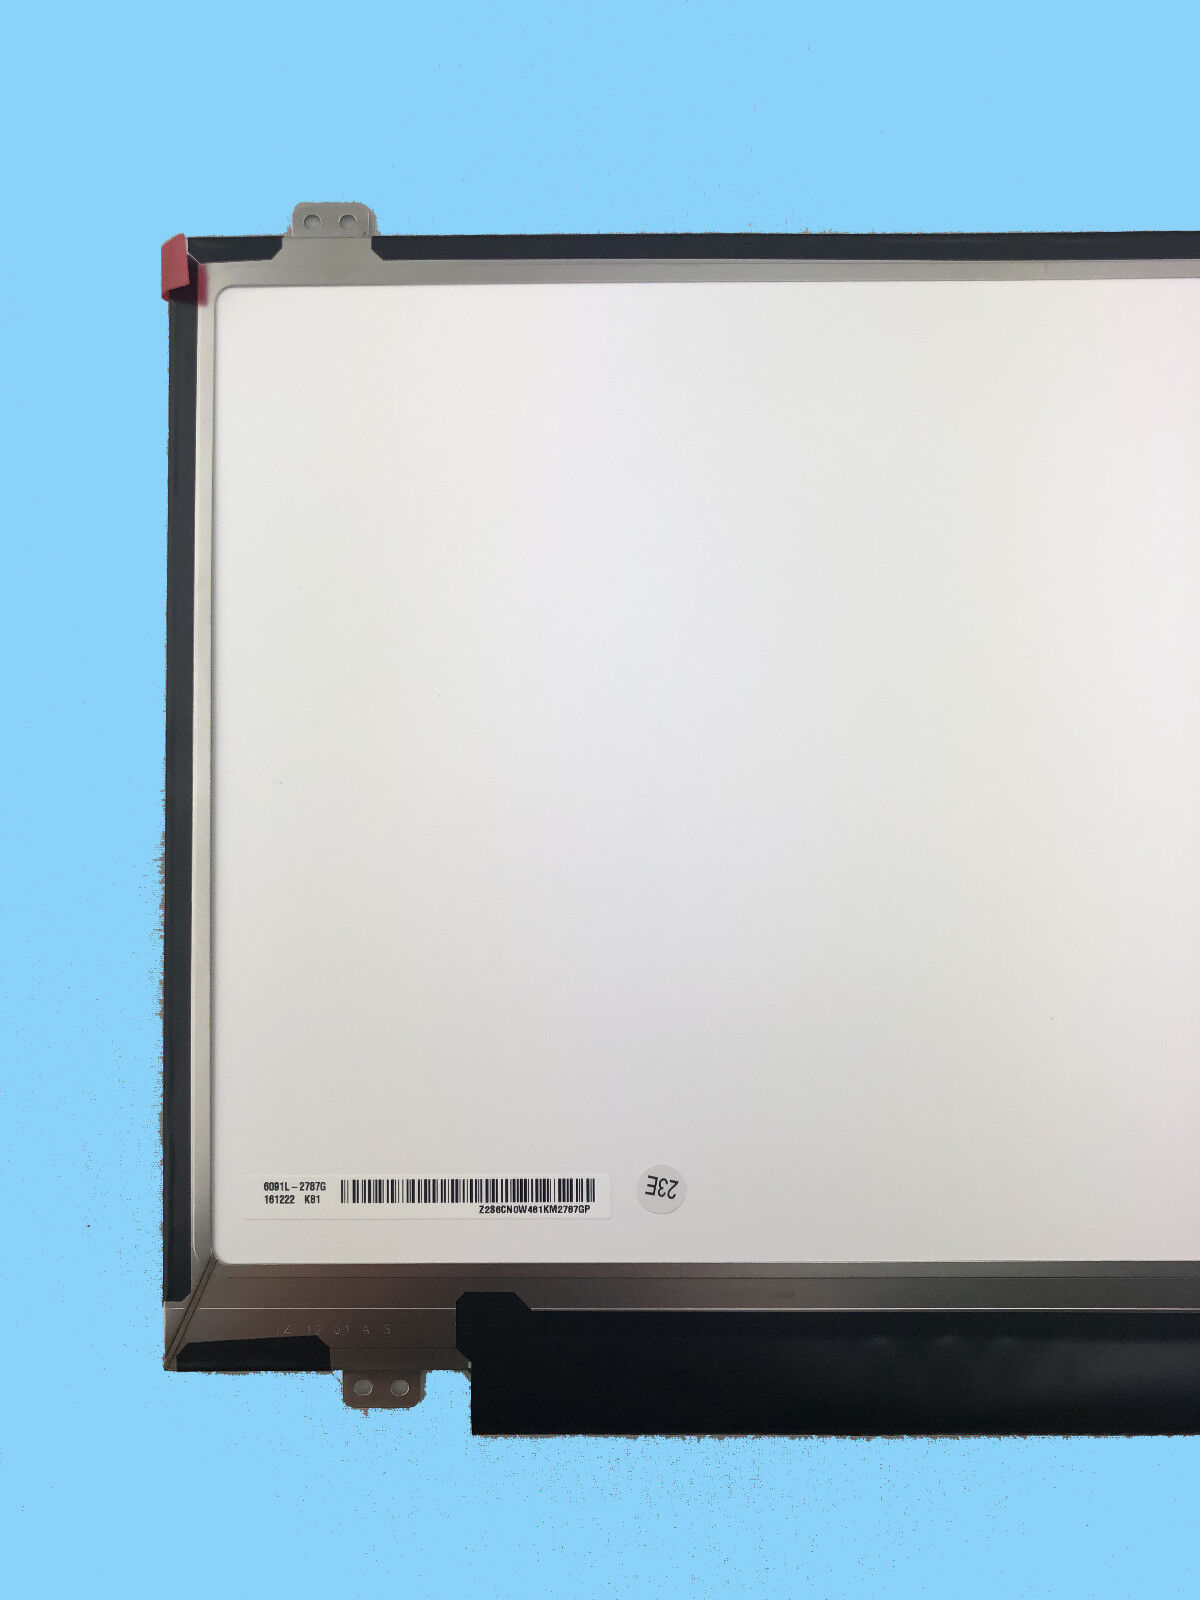 BRIGHTFOCAL New Screen for LP140WH8 LP140WH8 TP C1 A1 TPA1 TPC1 14.0 WXGA Slim EDP HD LED Replacement LCD Screen Display TP